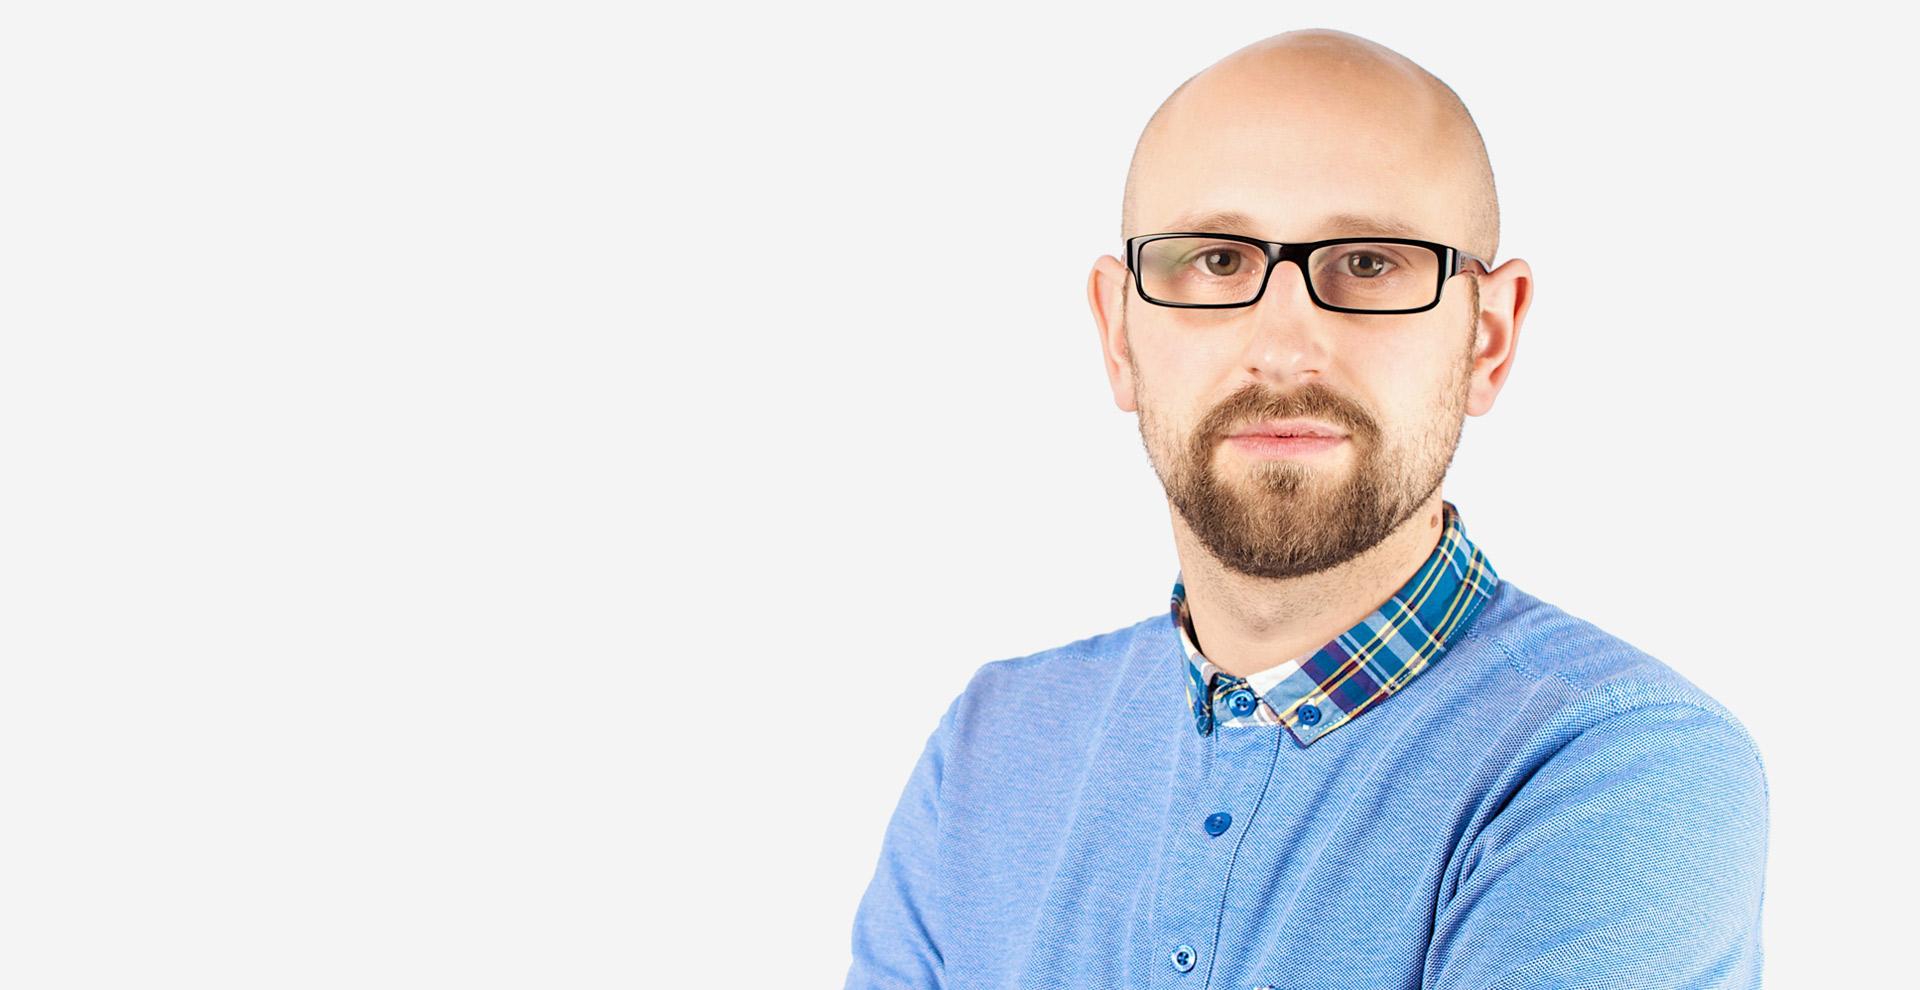 Tim Hunt, editor of Ethical Consumer magazine